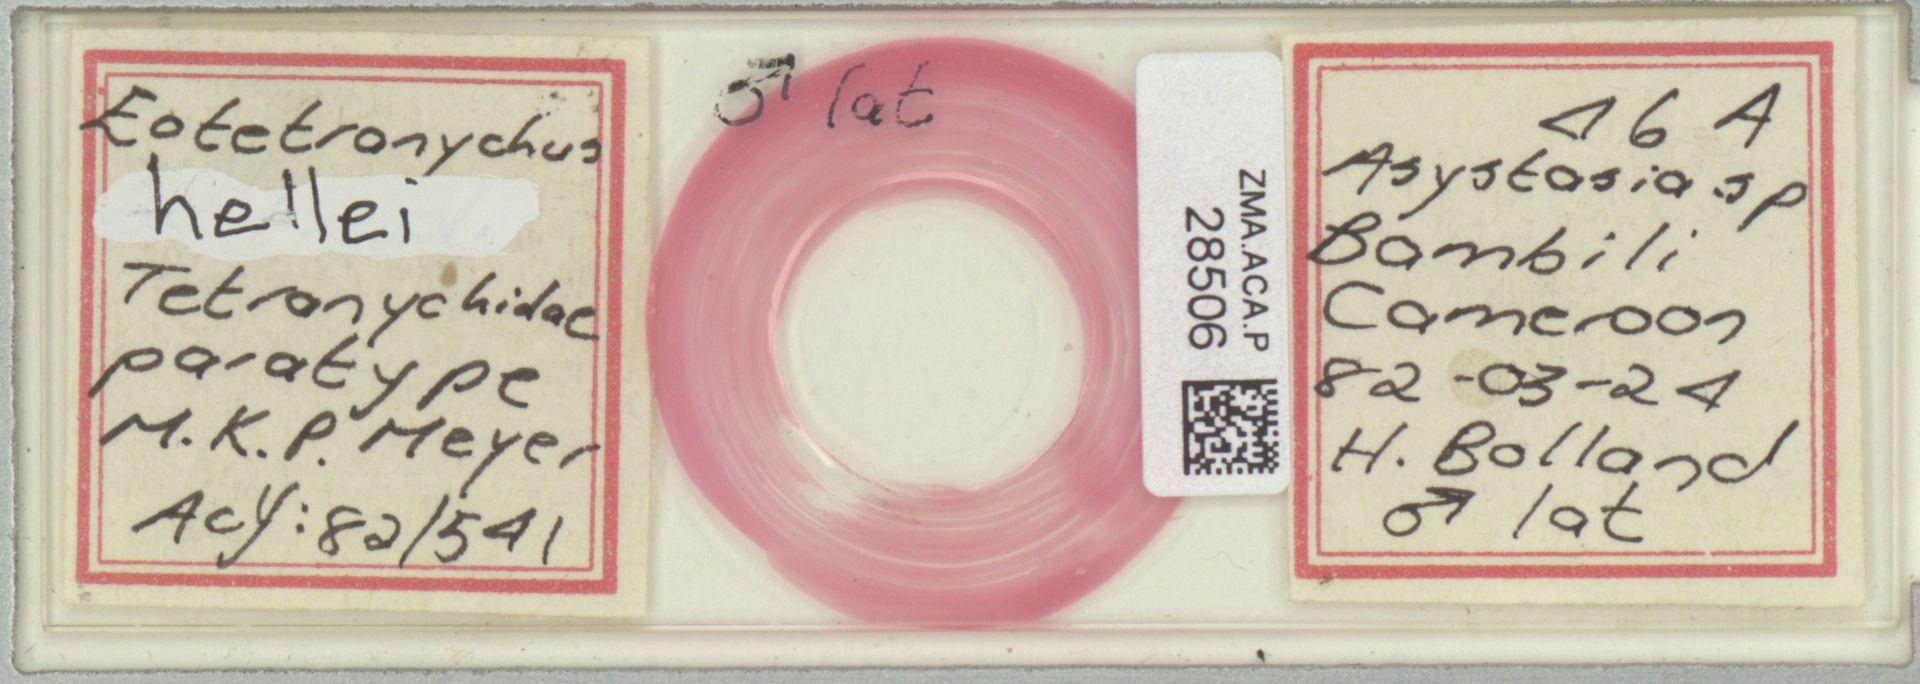 ZMA.ACA.P.28506 | Eotetranychus hellei